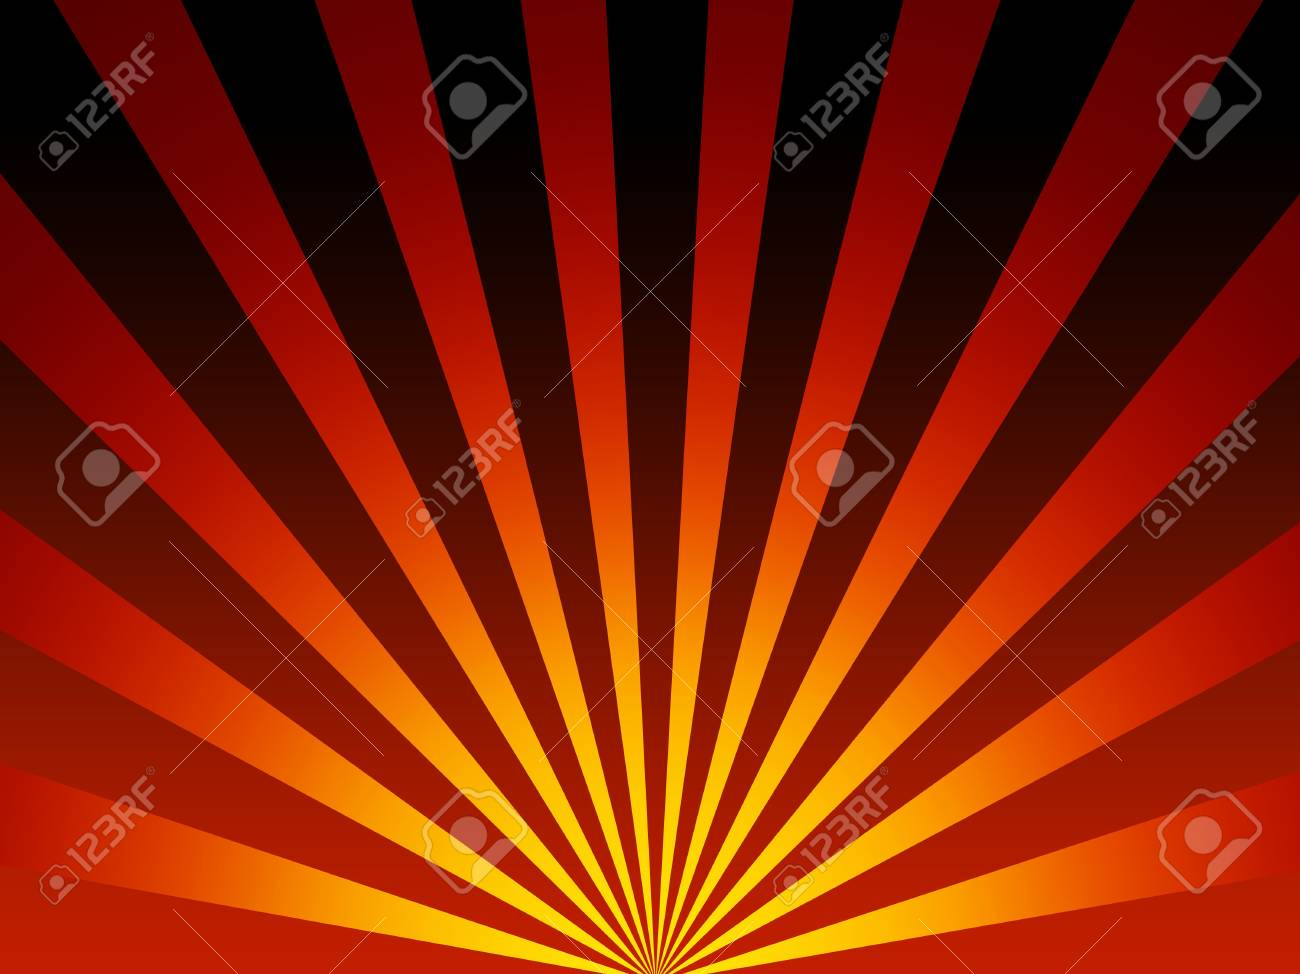 ray background Stock Photo - 16235438